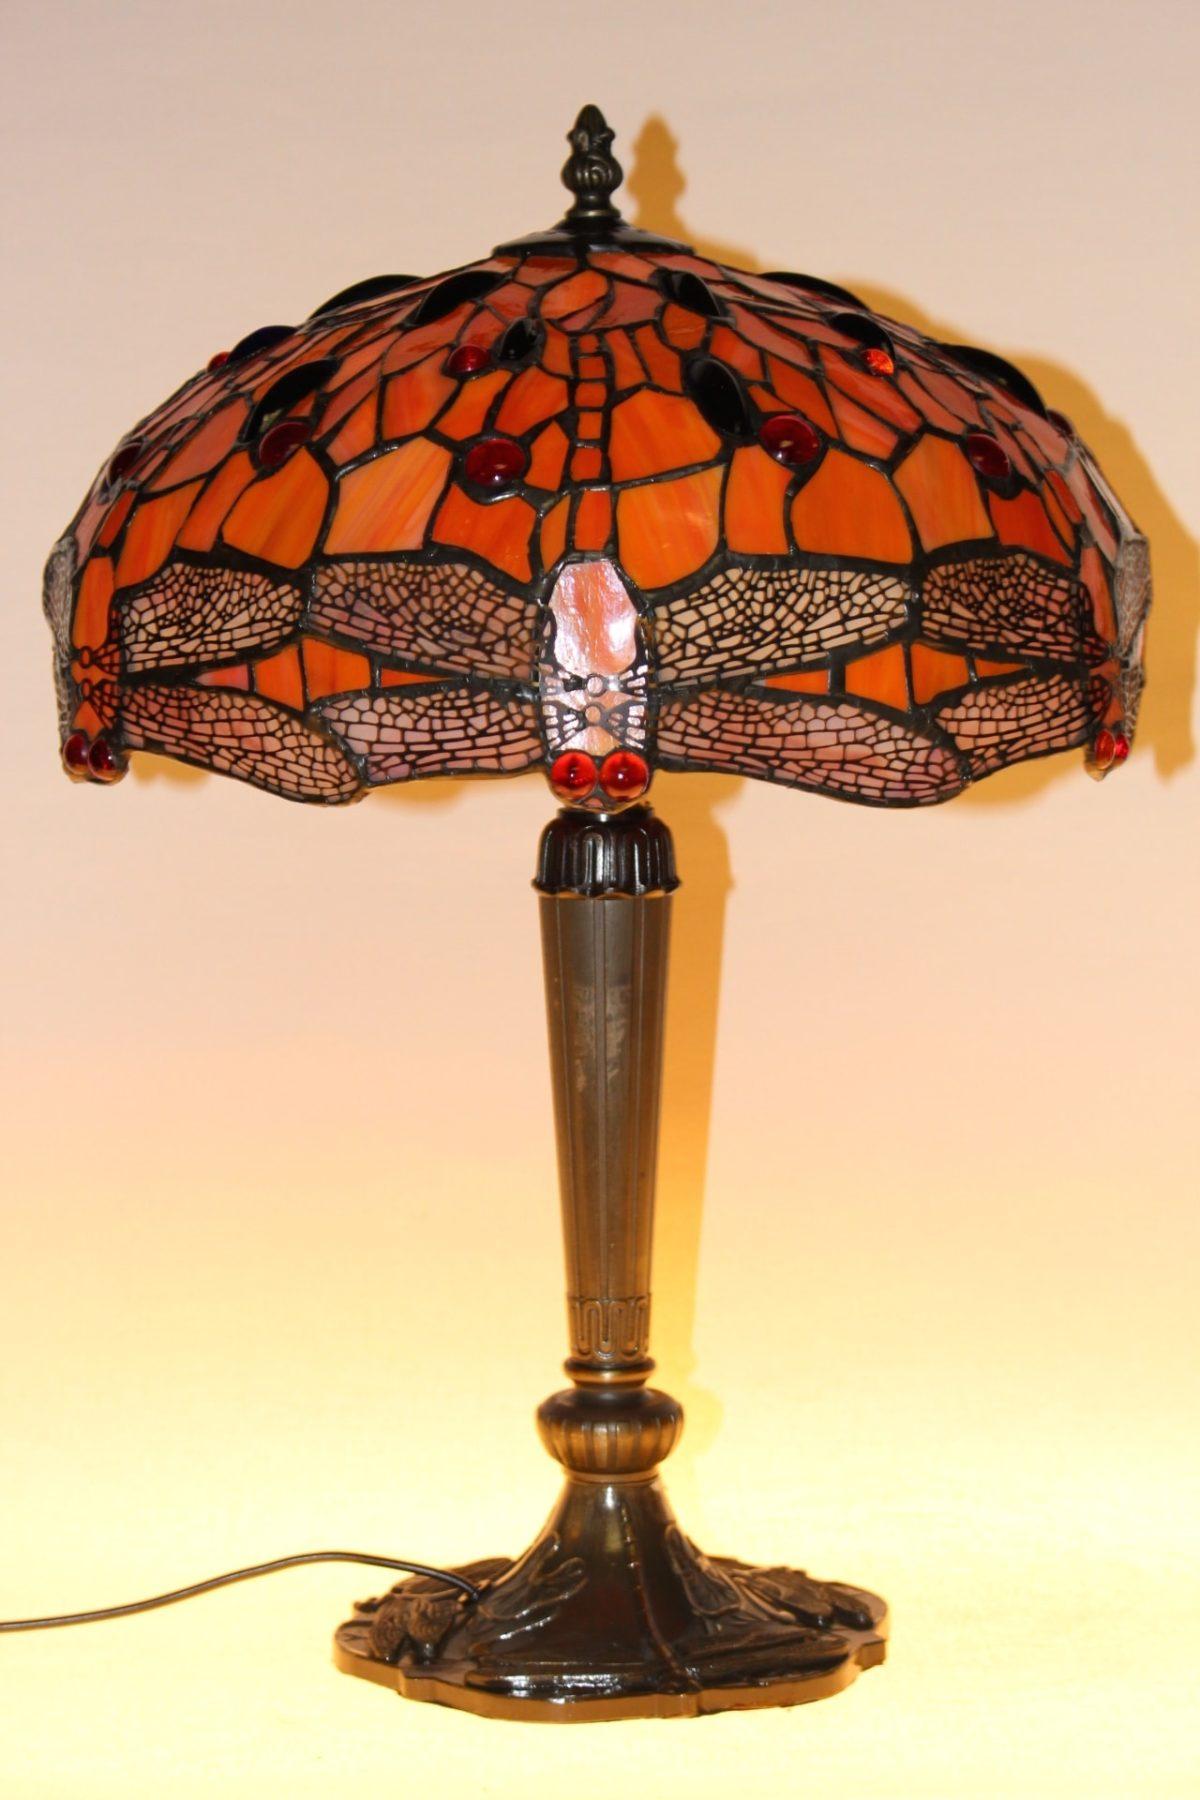 Tiffany Lampe, 47 x 31 x 18 cm